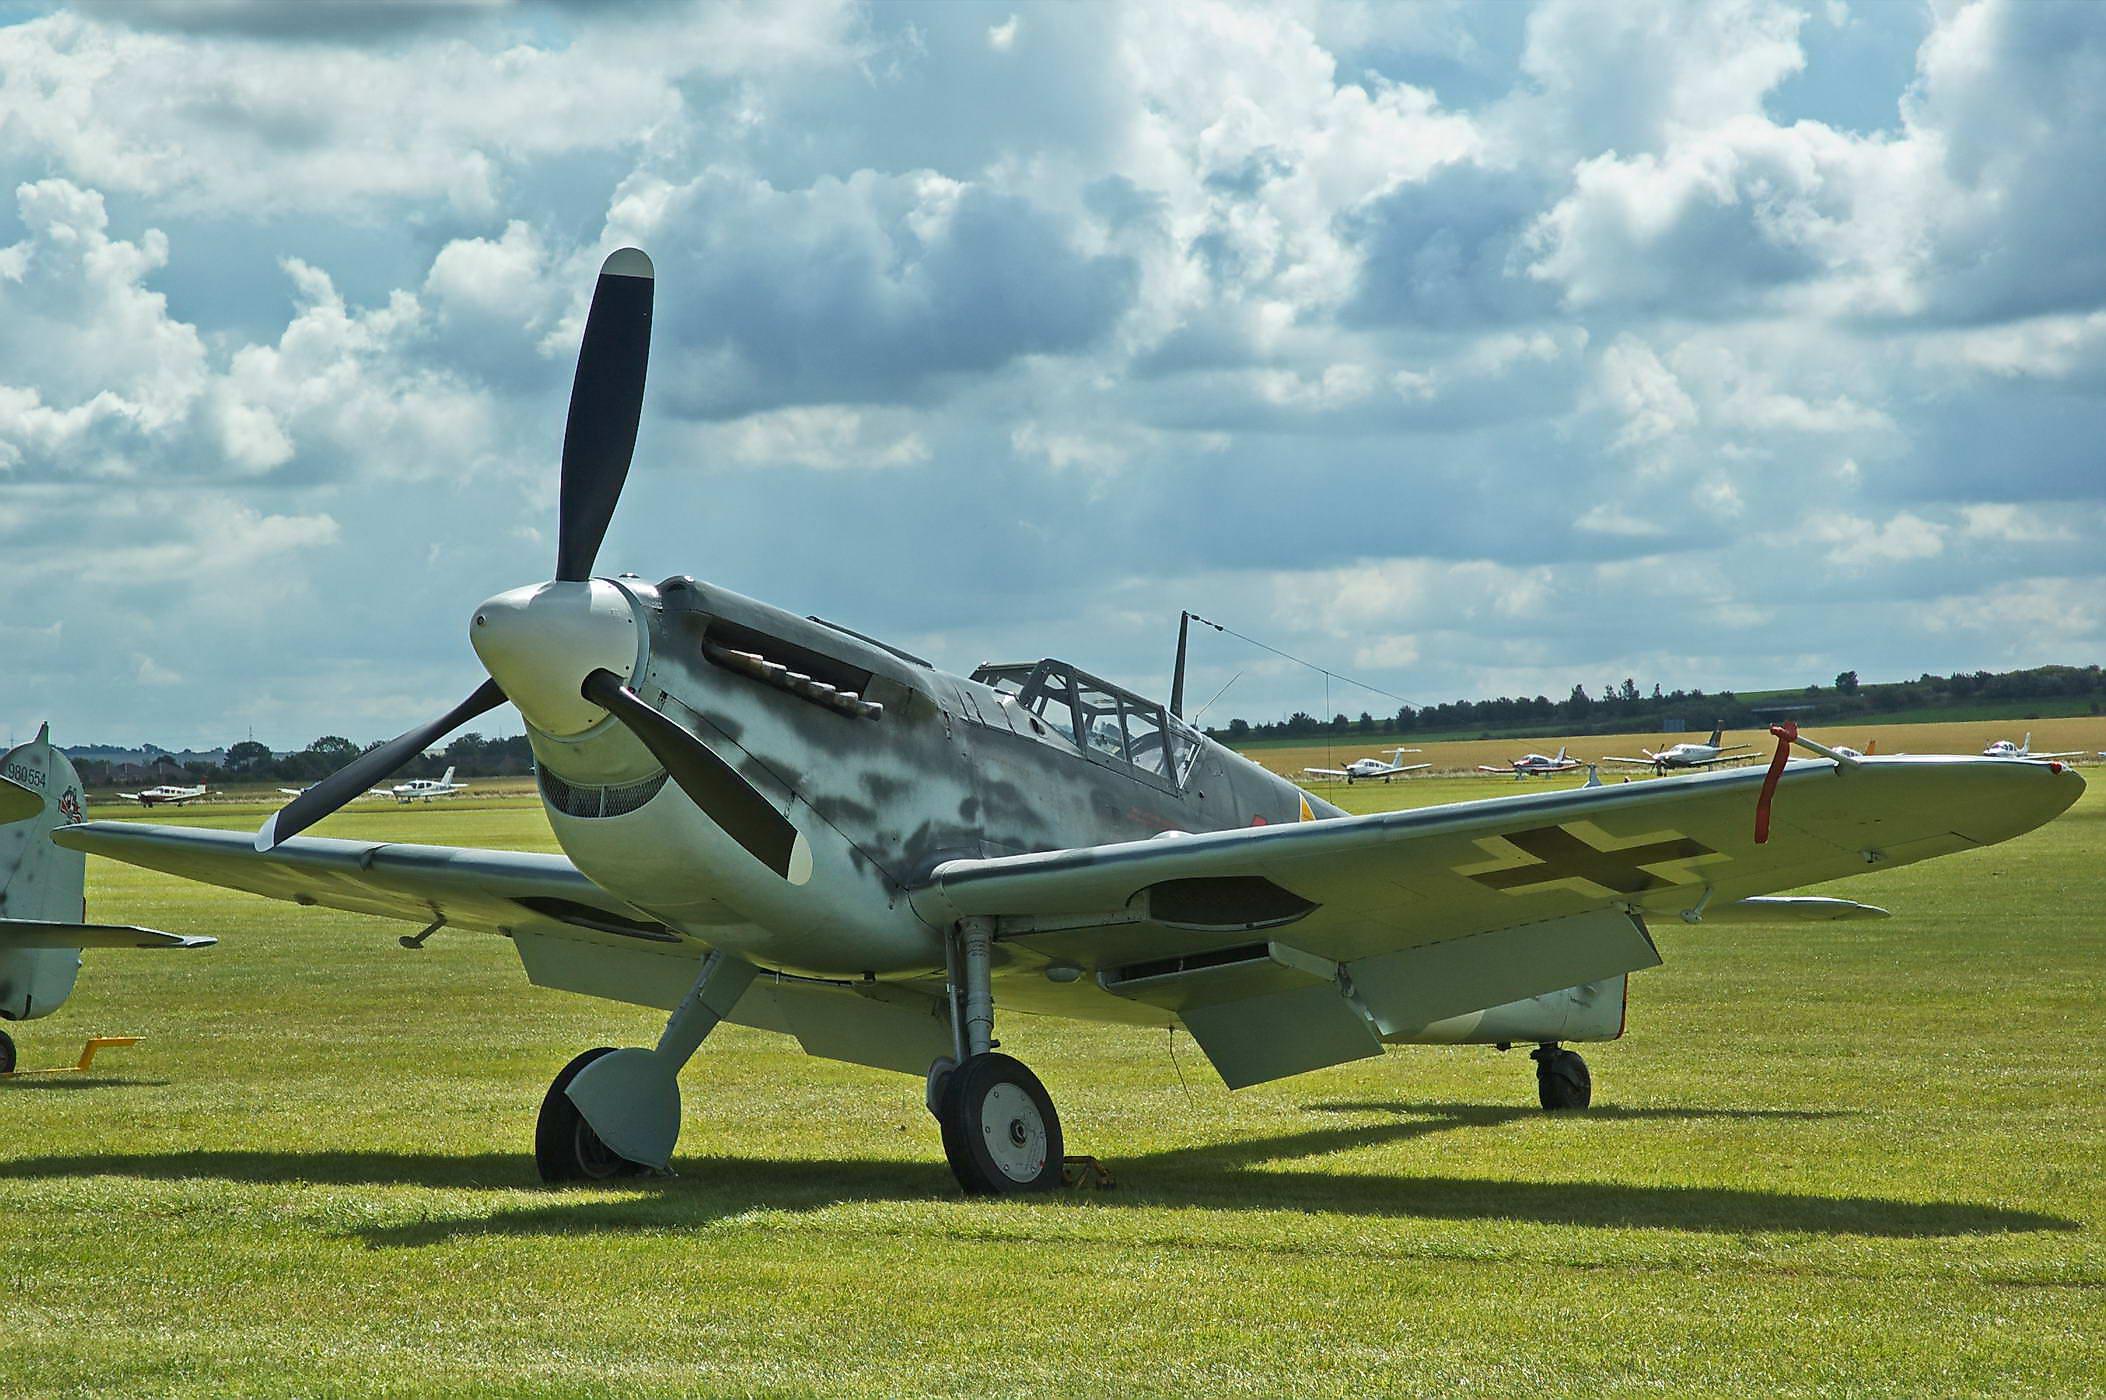 Hispano HA-1112-M1L Buchon C.4K-102